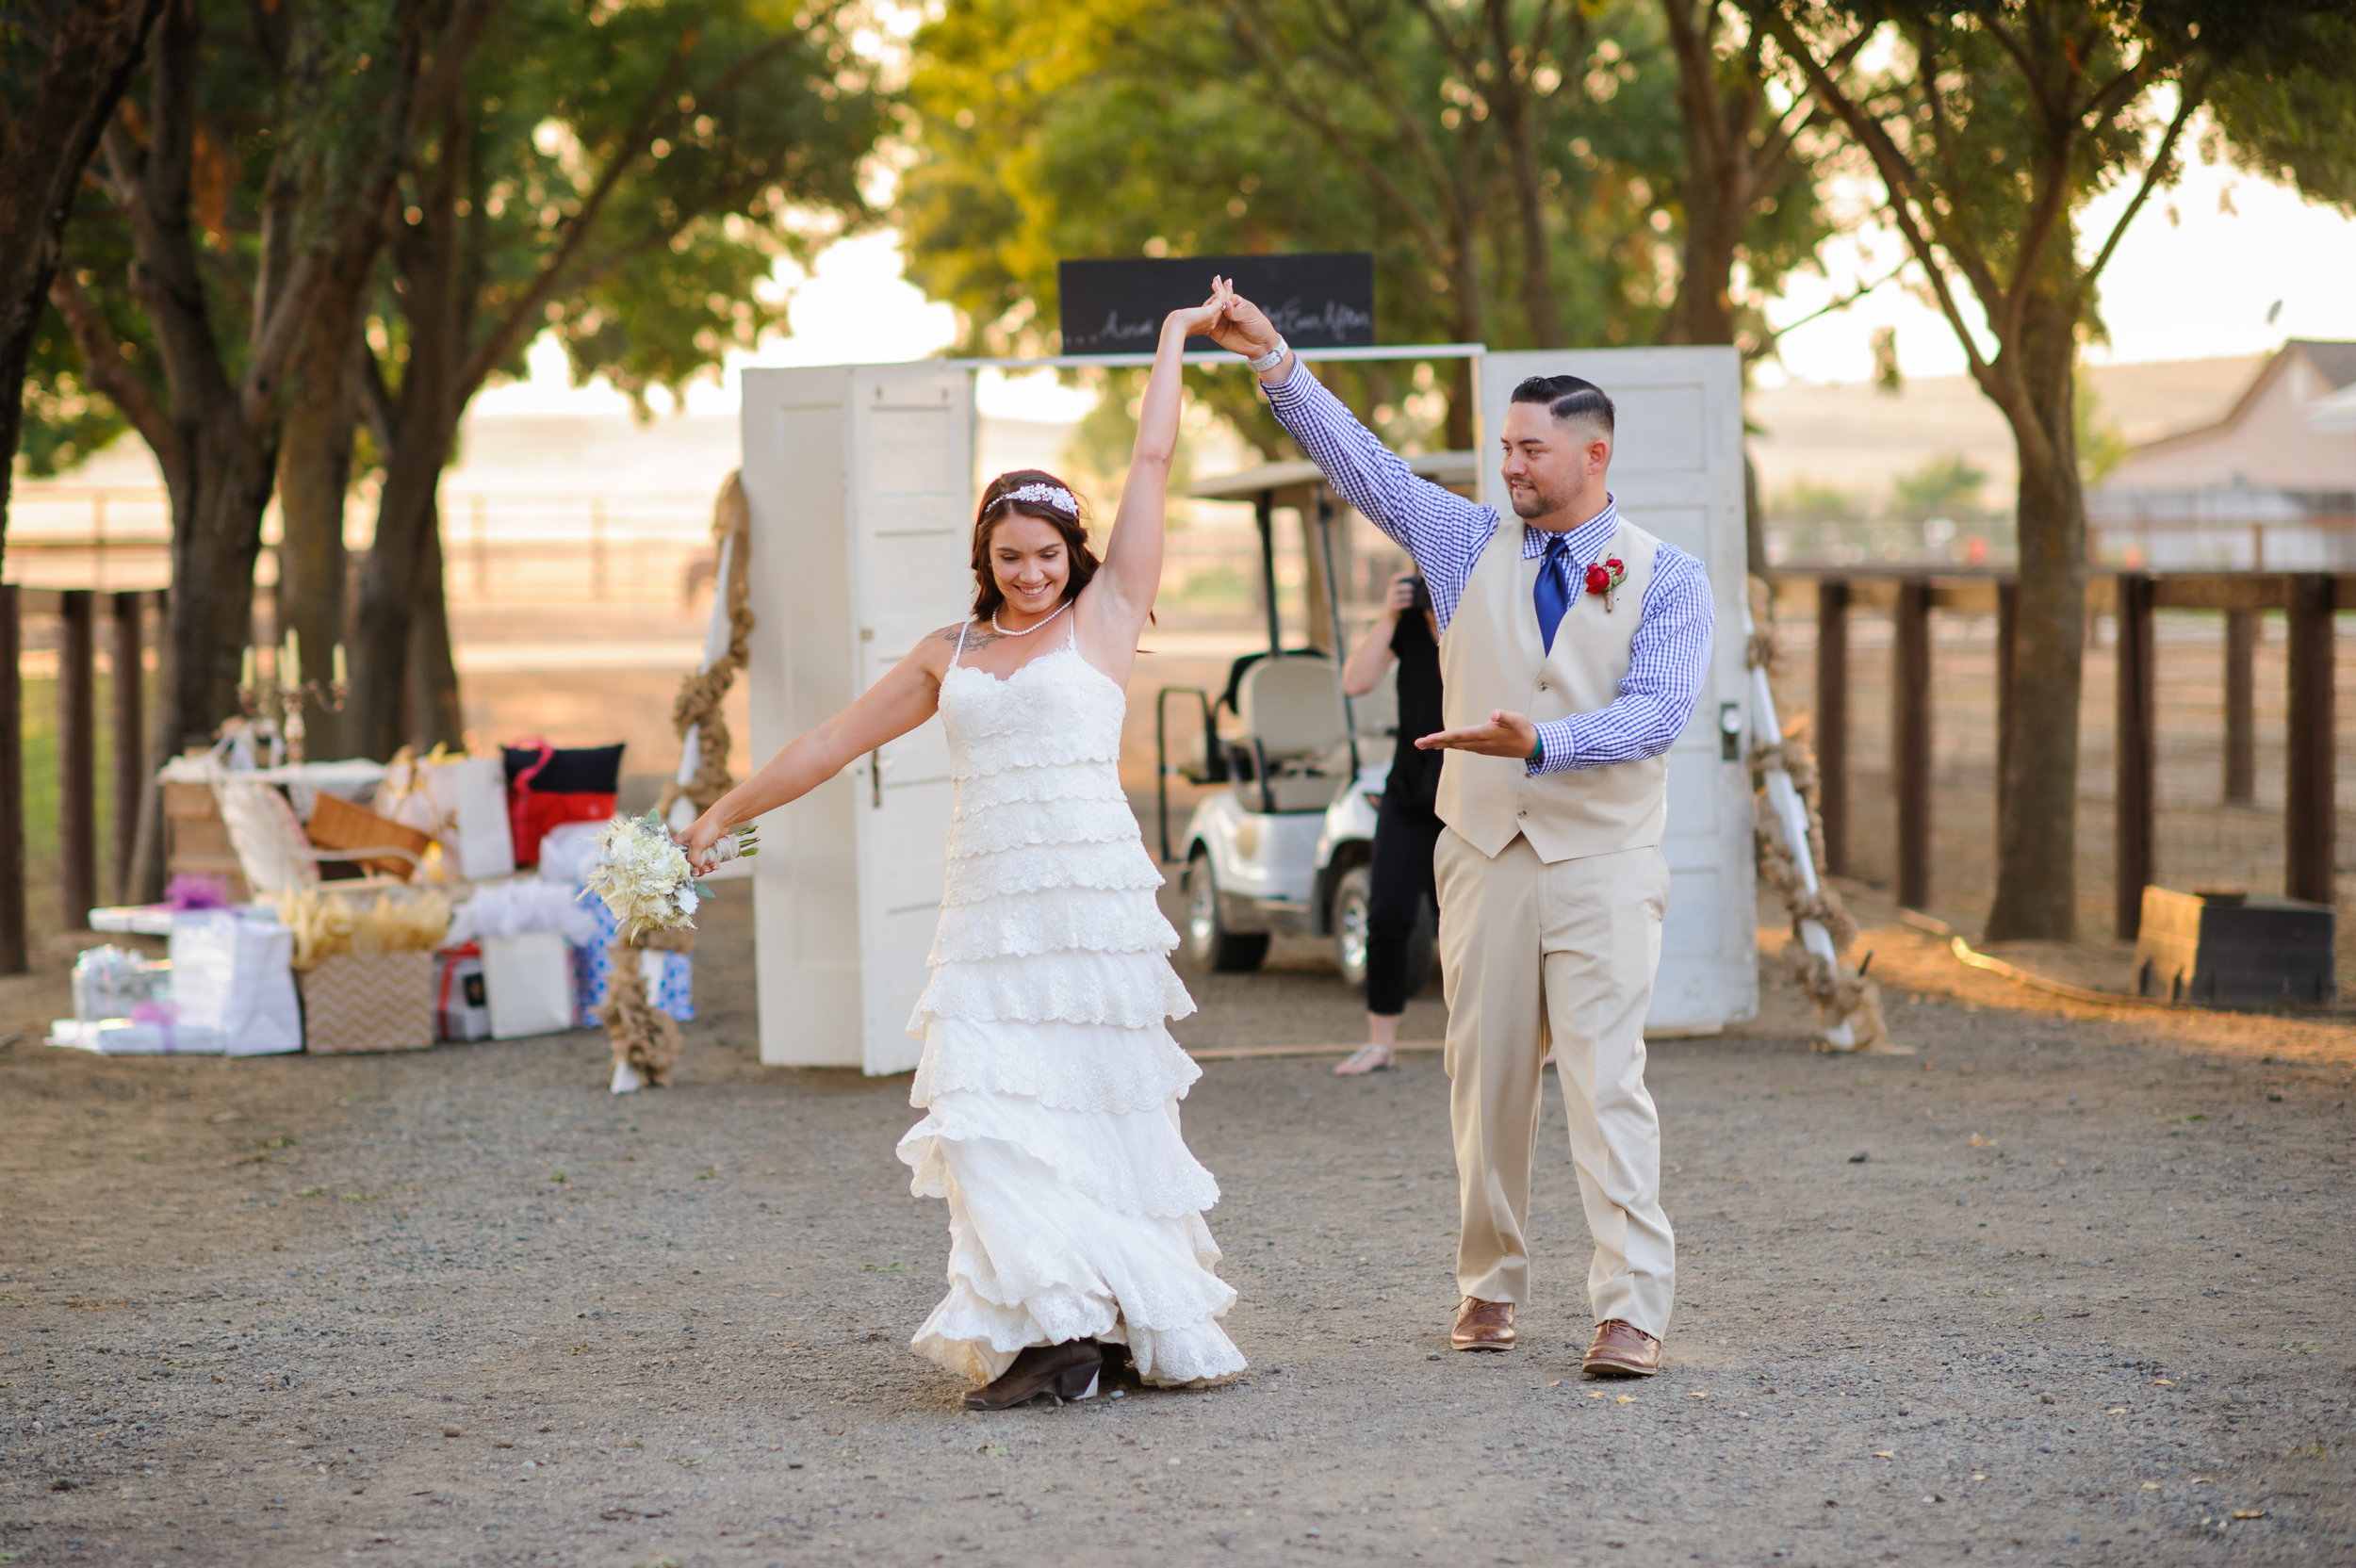 carly-geoff-028-horse-ranch-western-sacramento-wedding-photographer-katherine-nicole-photography.JPG